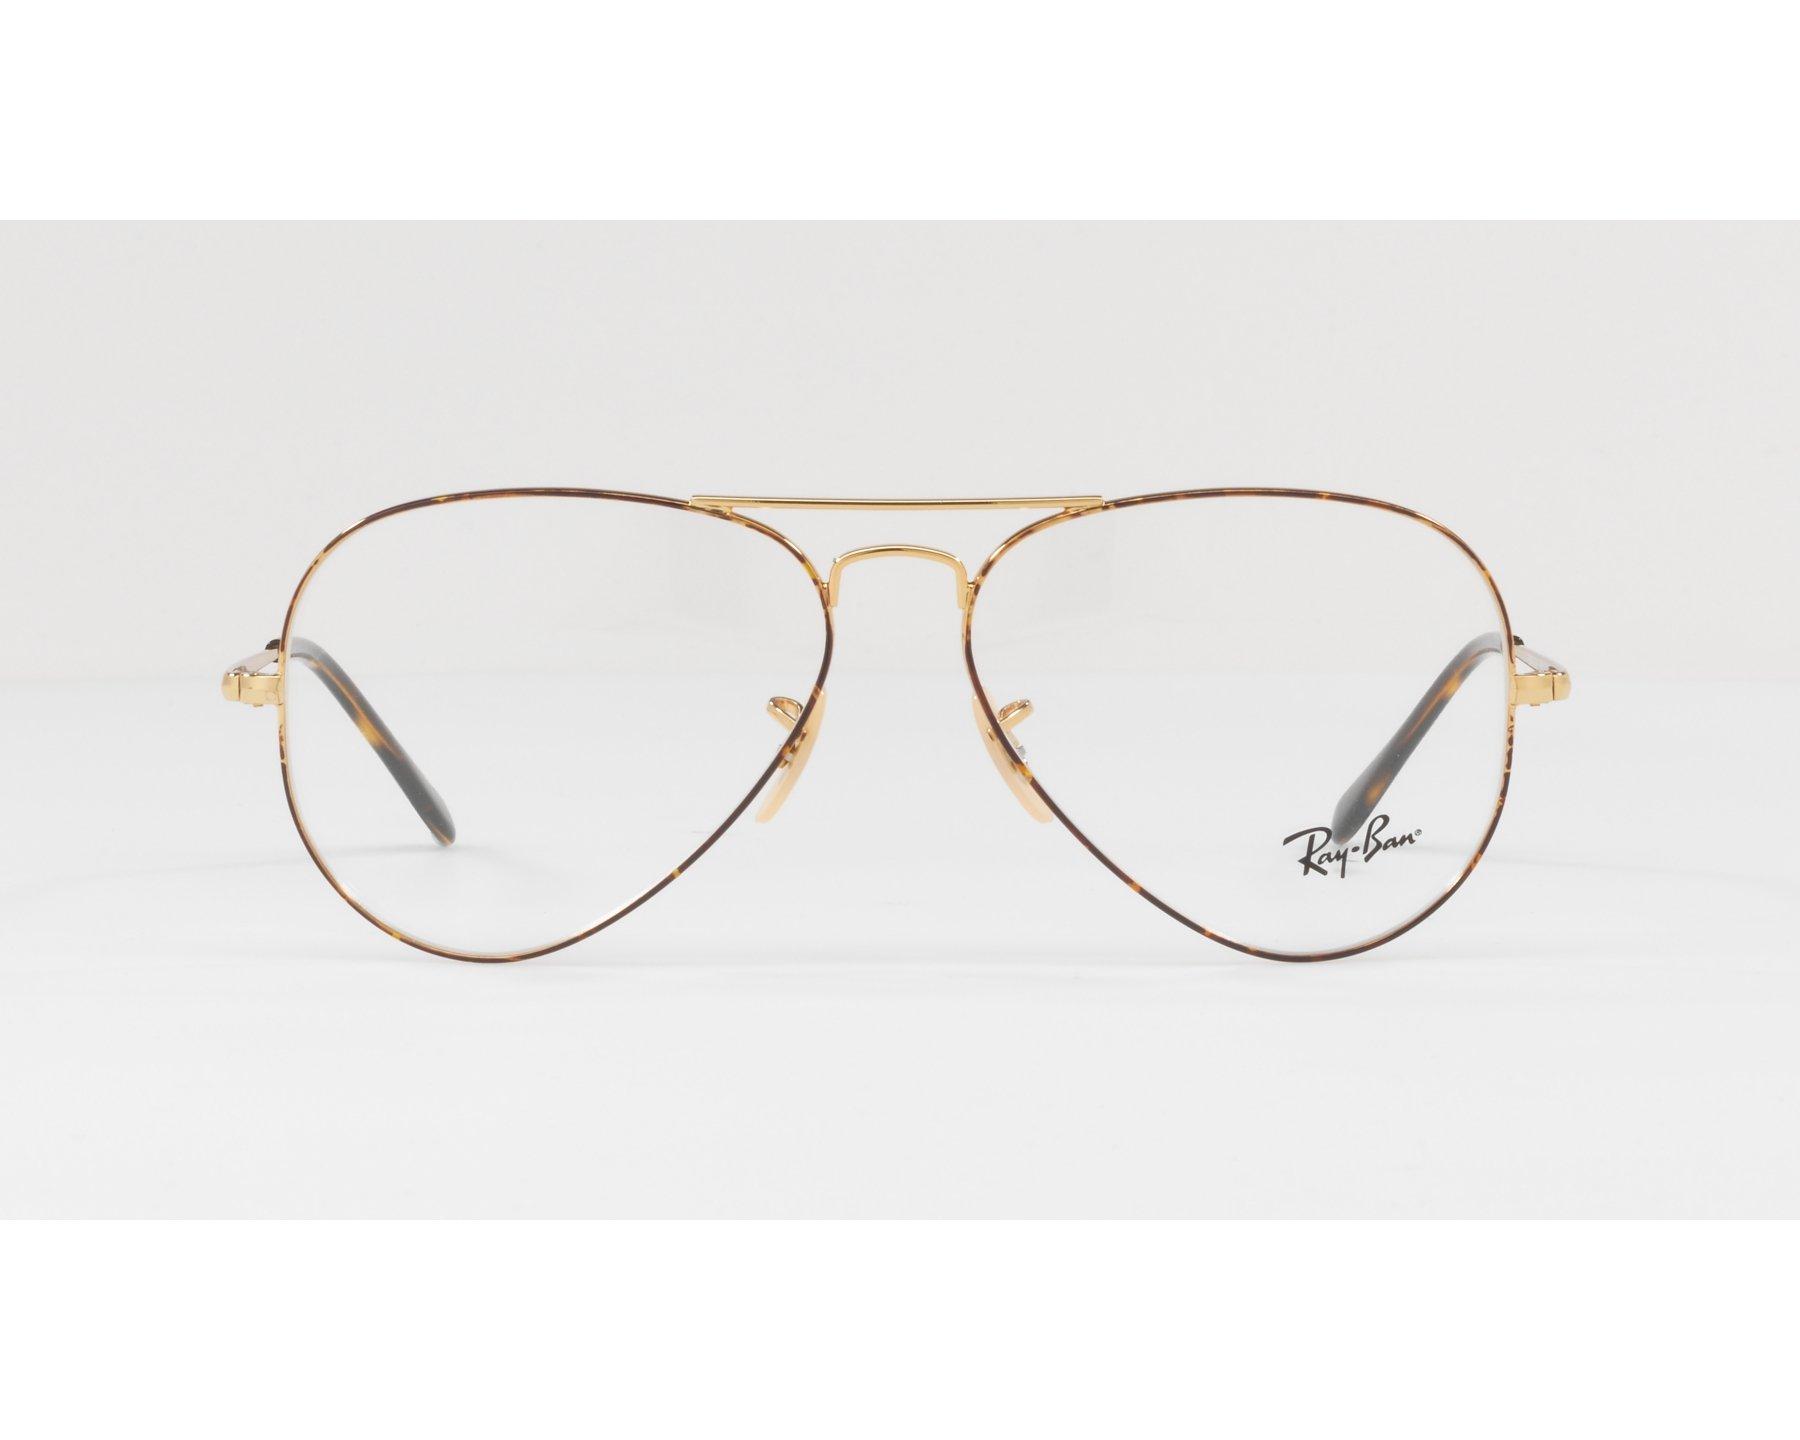 395c7f91f1aa4c eyeglasses Ray-Ban RX-6489 2945 55-14 Havana Gold 360 degree view